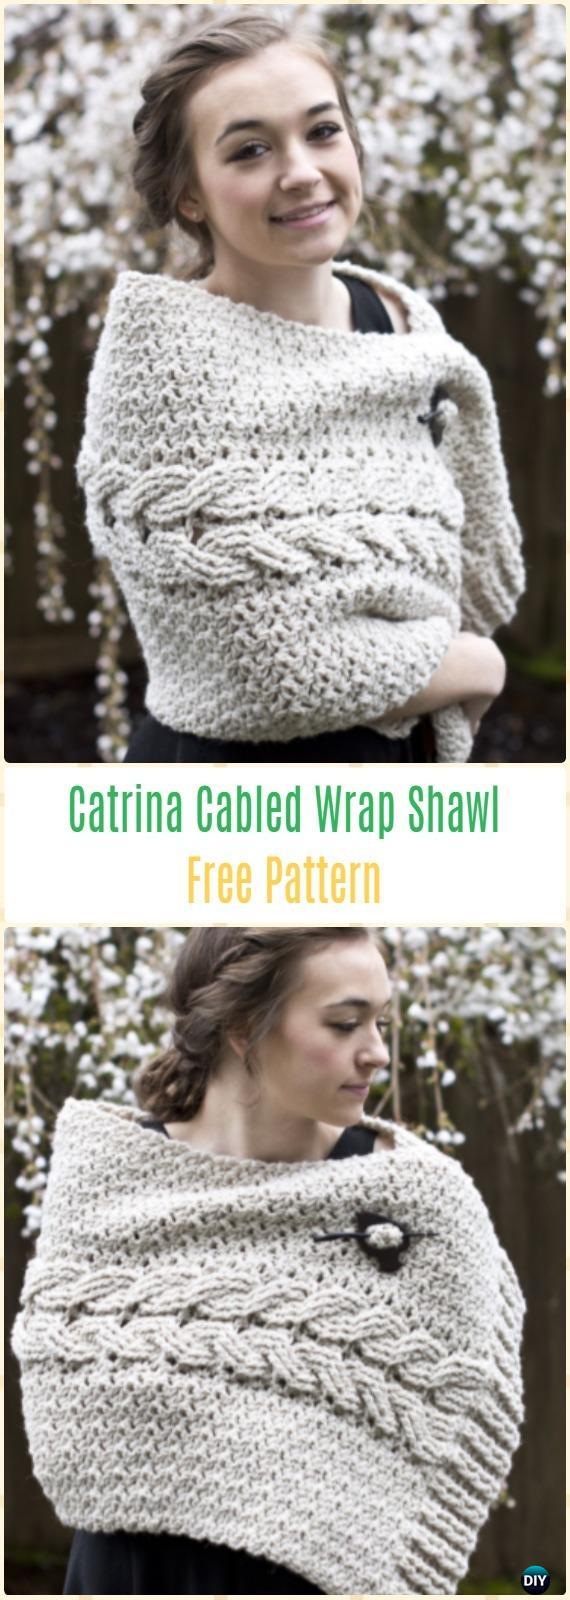 Crochet Ecological Wool Catrina Cabled Wrap Shawl Free Pattern - Crochet Women Shawl Sweater Outwear Free Patterns